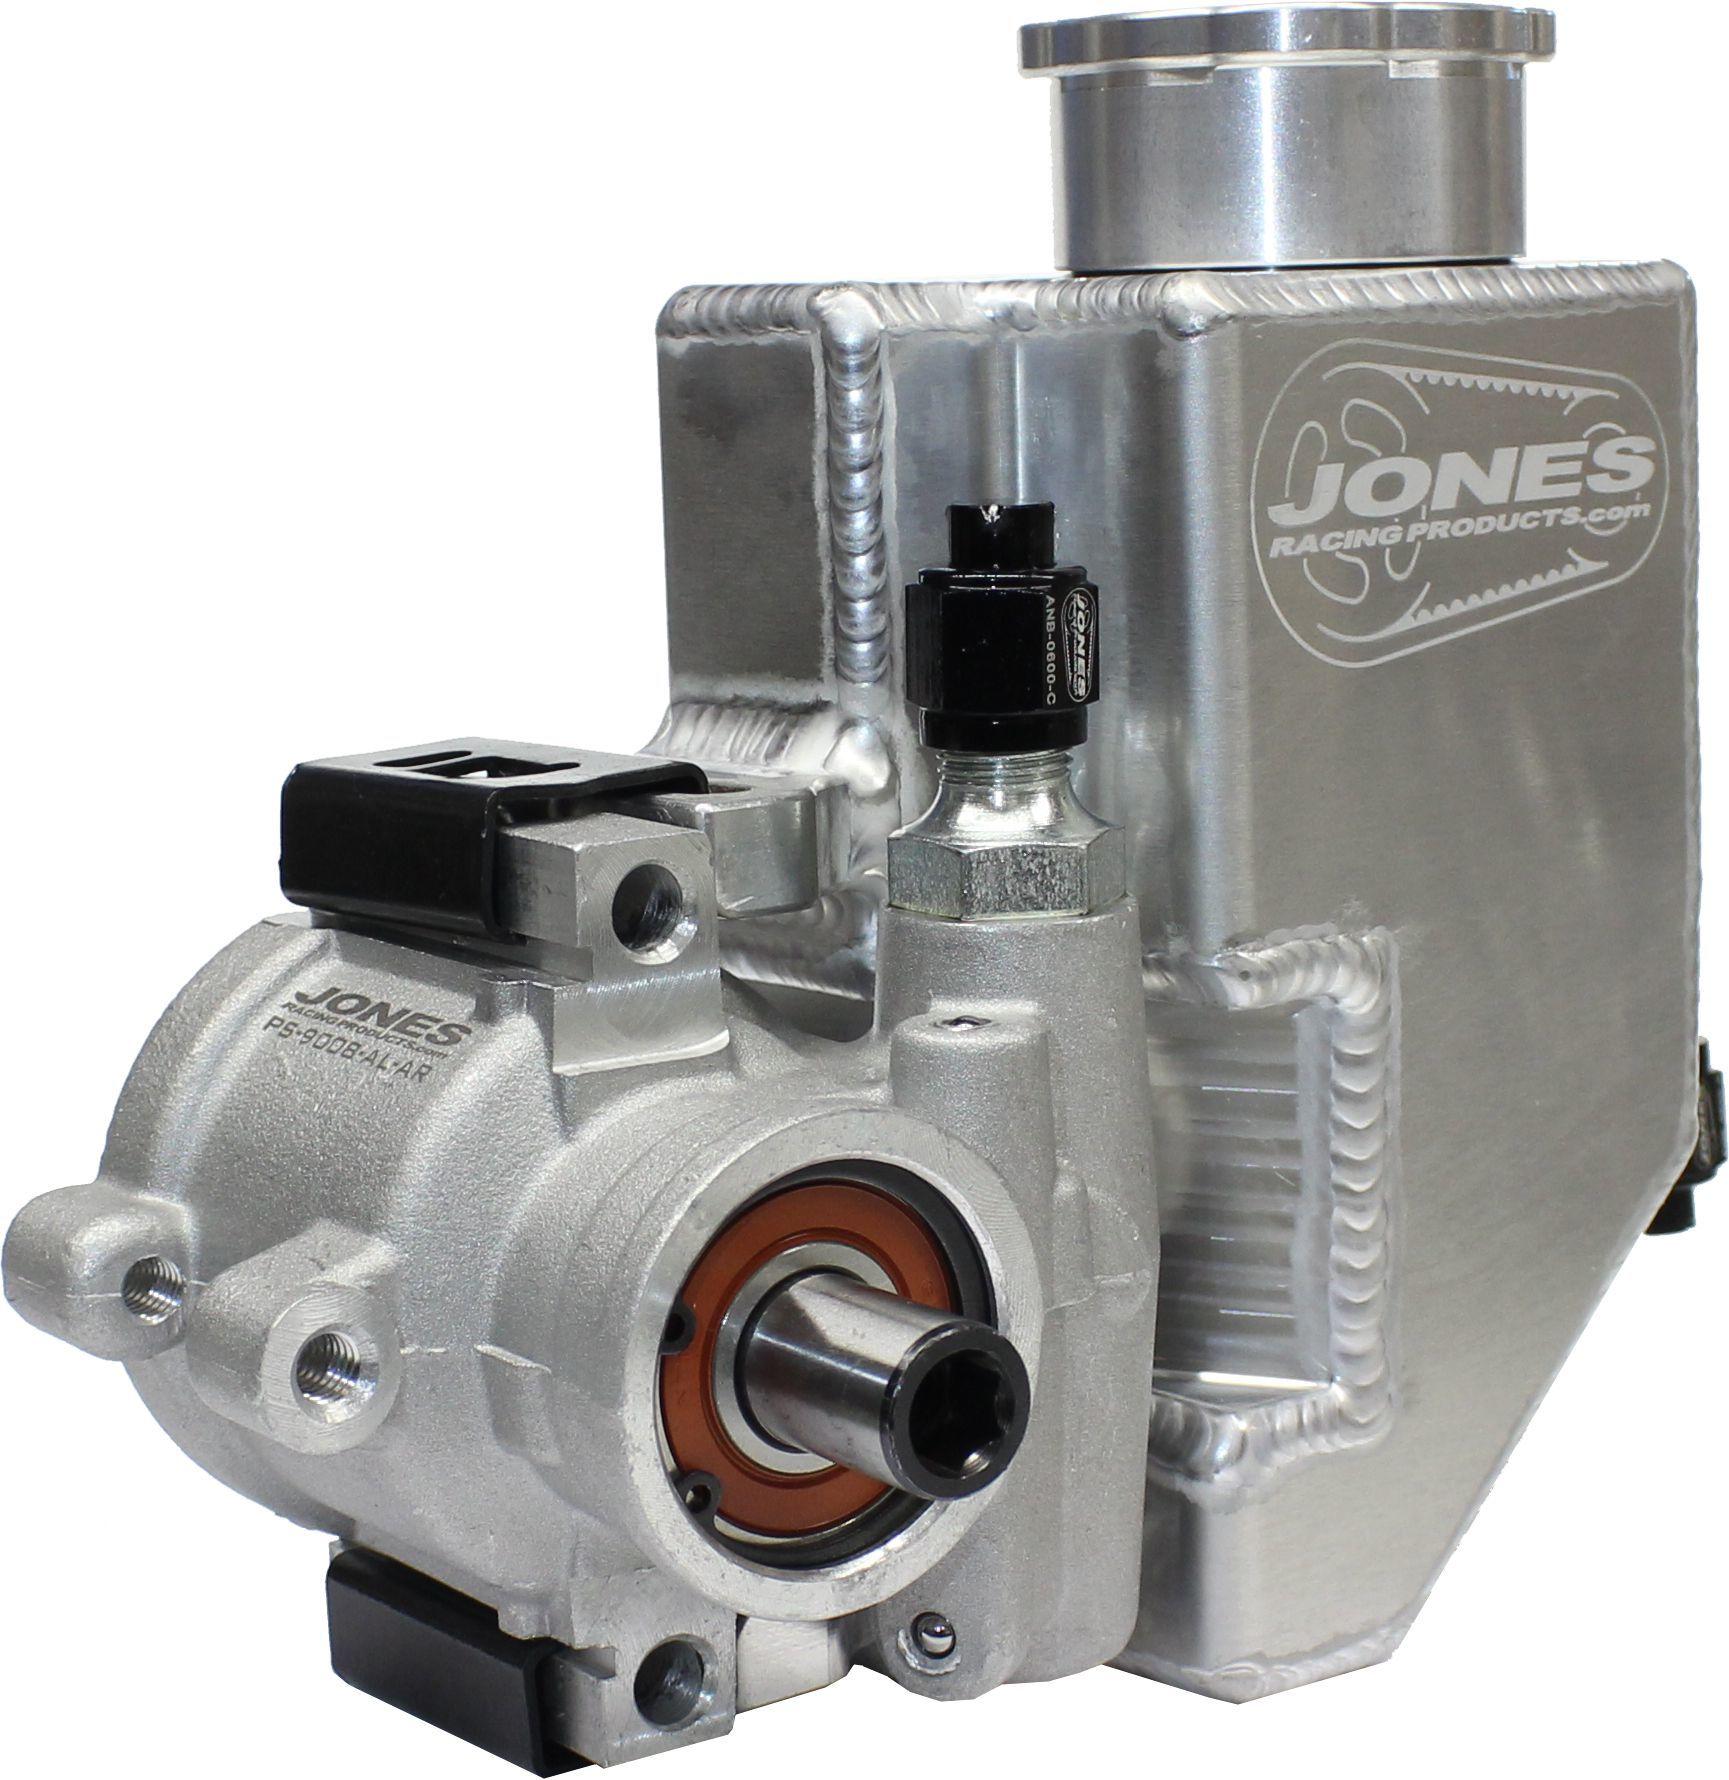 Jones Racing Products PS-9008-AL-AR Power Steering Pump, GM Type 2, 1100 psi, Aluminum Reservoir, Aluminum, Natural, Universal, Each